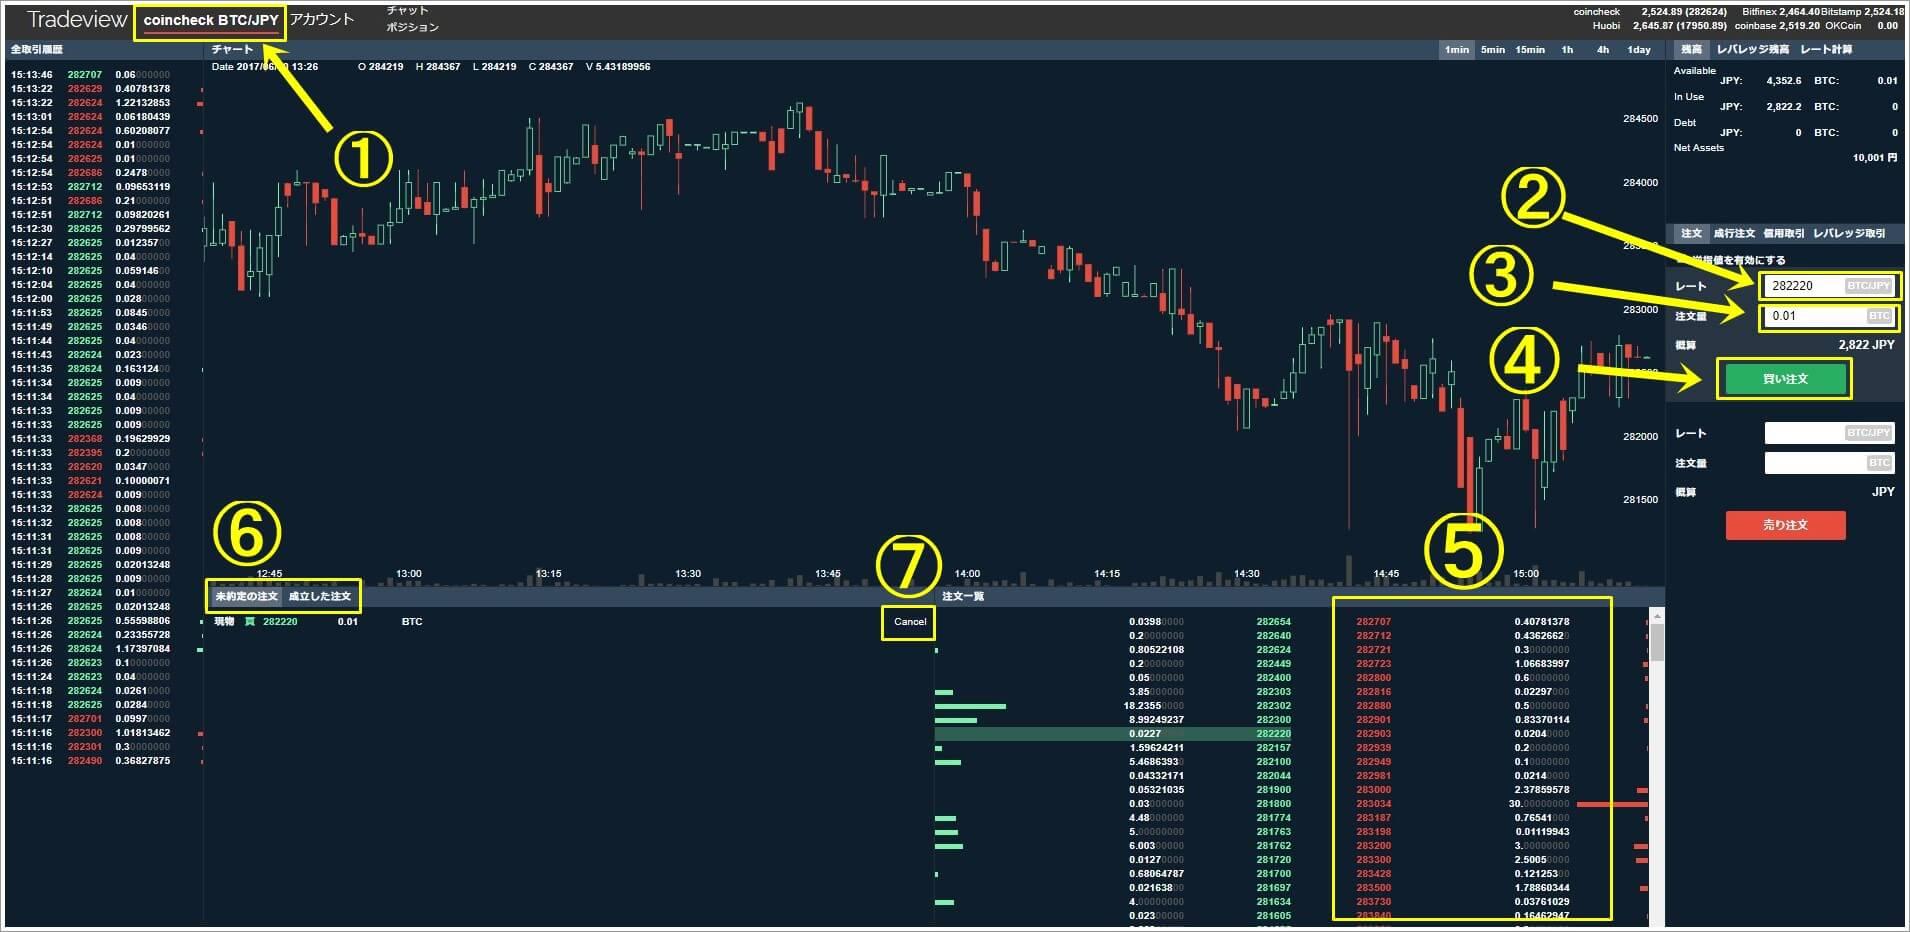 tradevidew注文の仕方